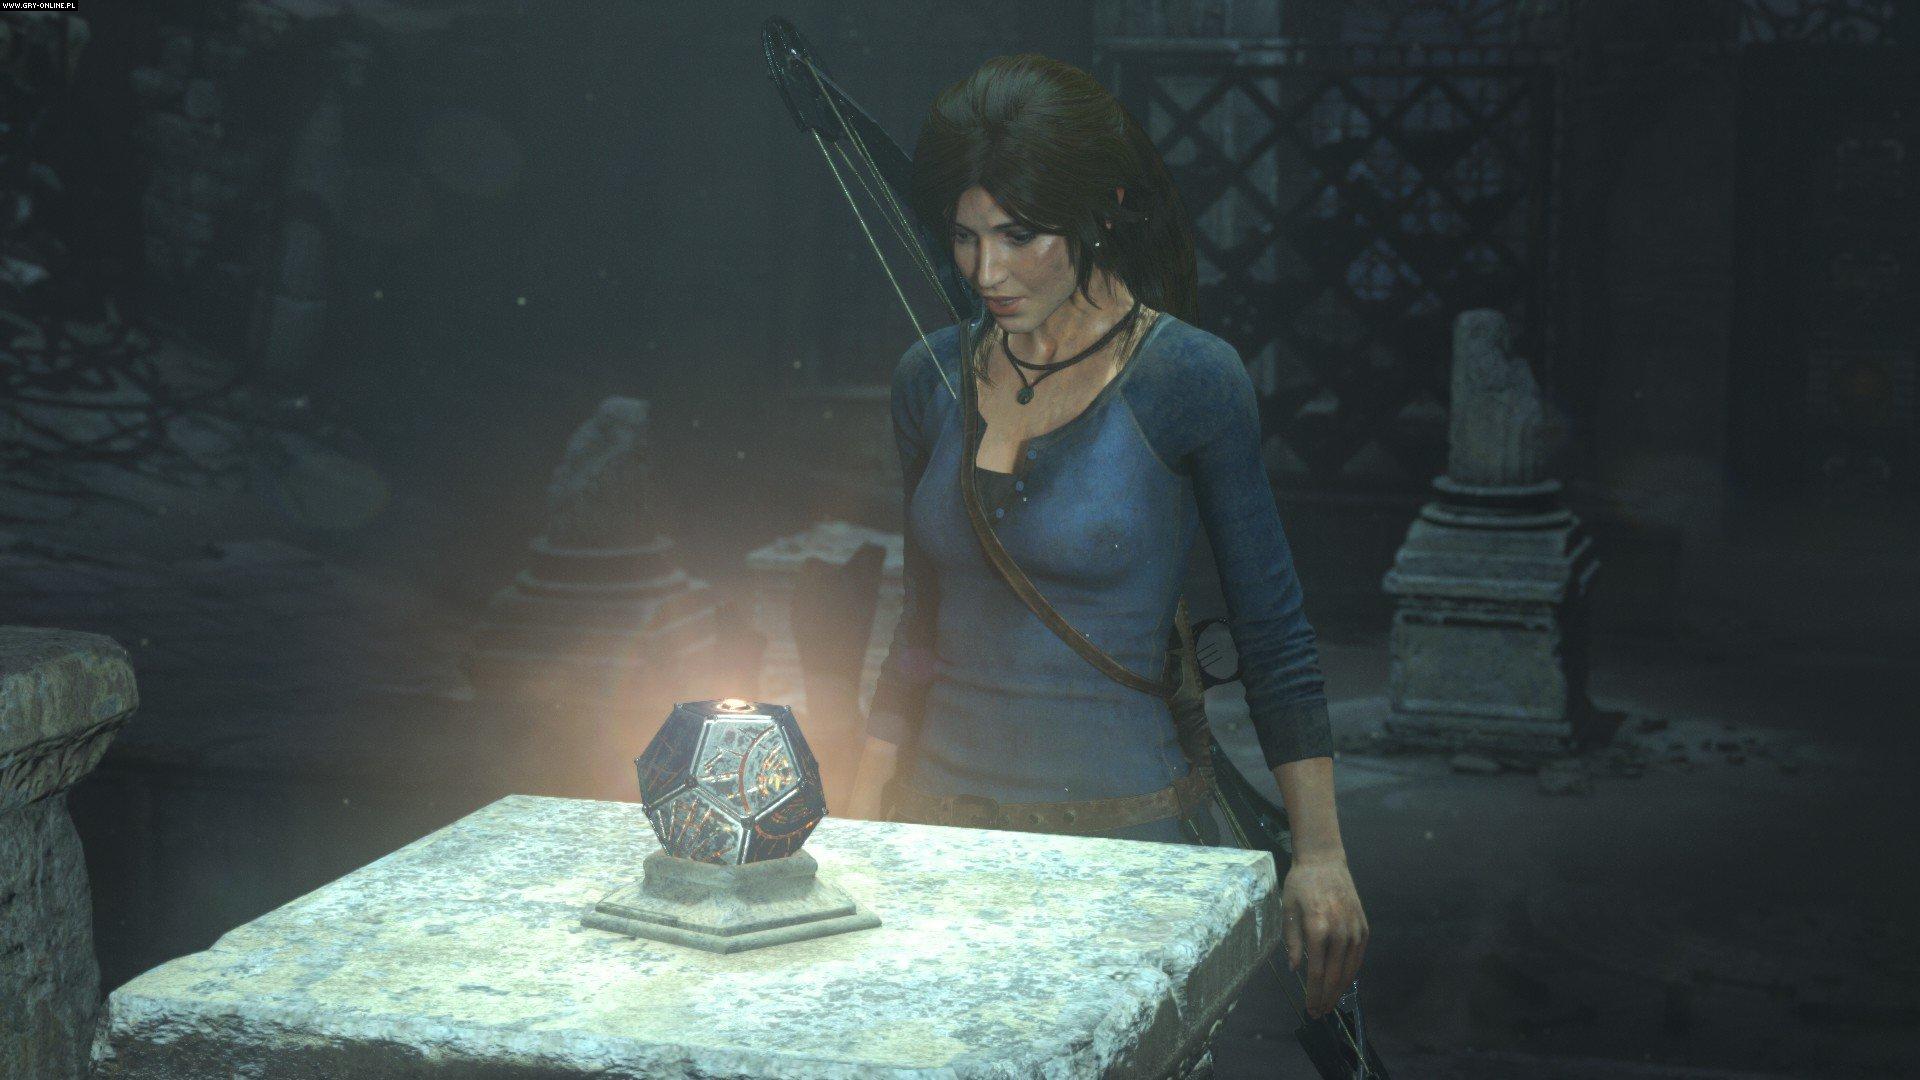 Rise of the Tomb Raider PC, XONE Games Image 37/126, Crystal Dynamics, Square-Enix / Eidos